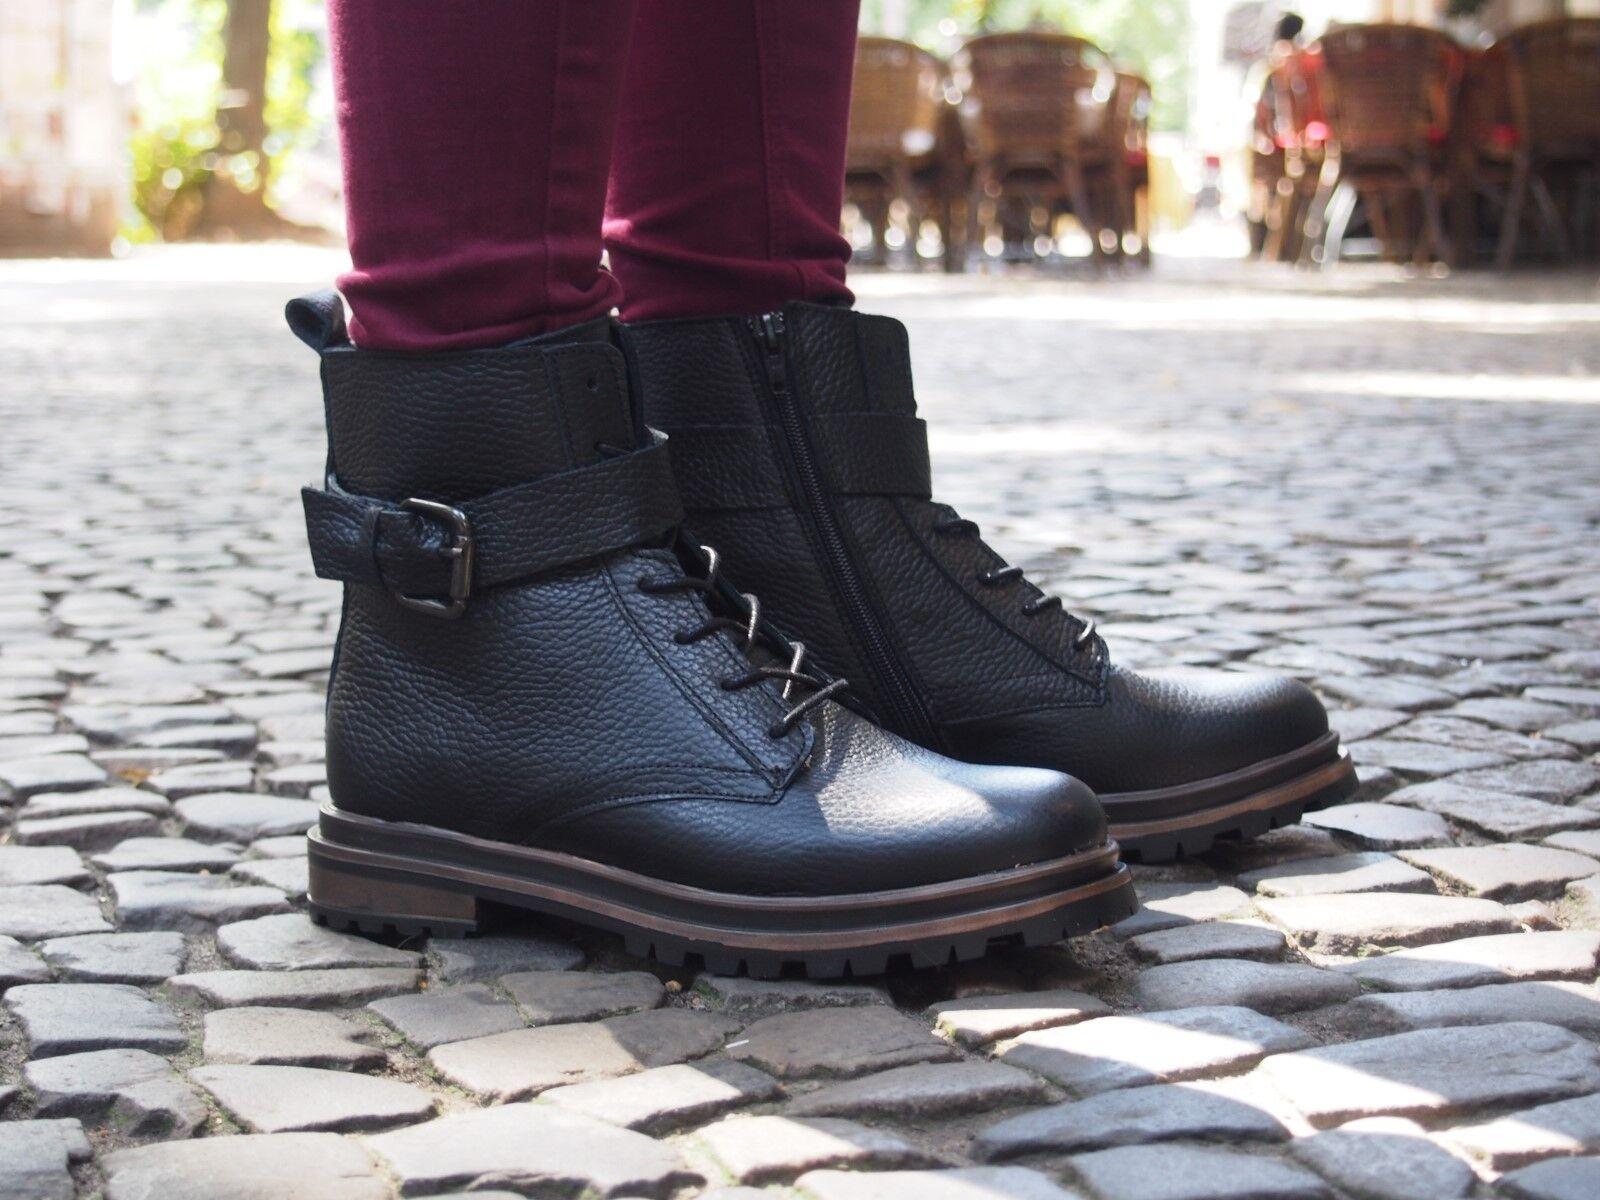 SPM Schuhe BBIM Lace Boot black schwarz Echtleder Stiefelette NEU Bnkle Boot